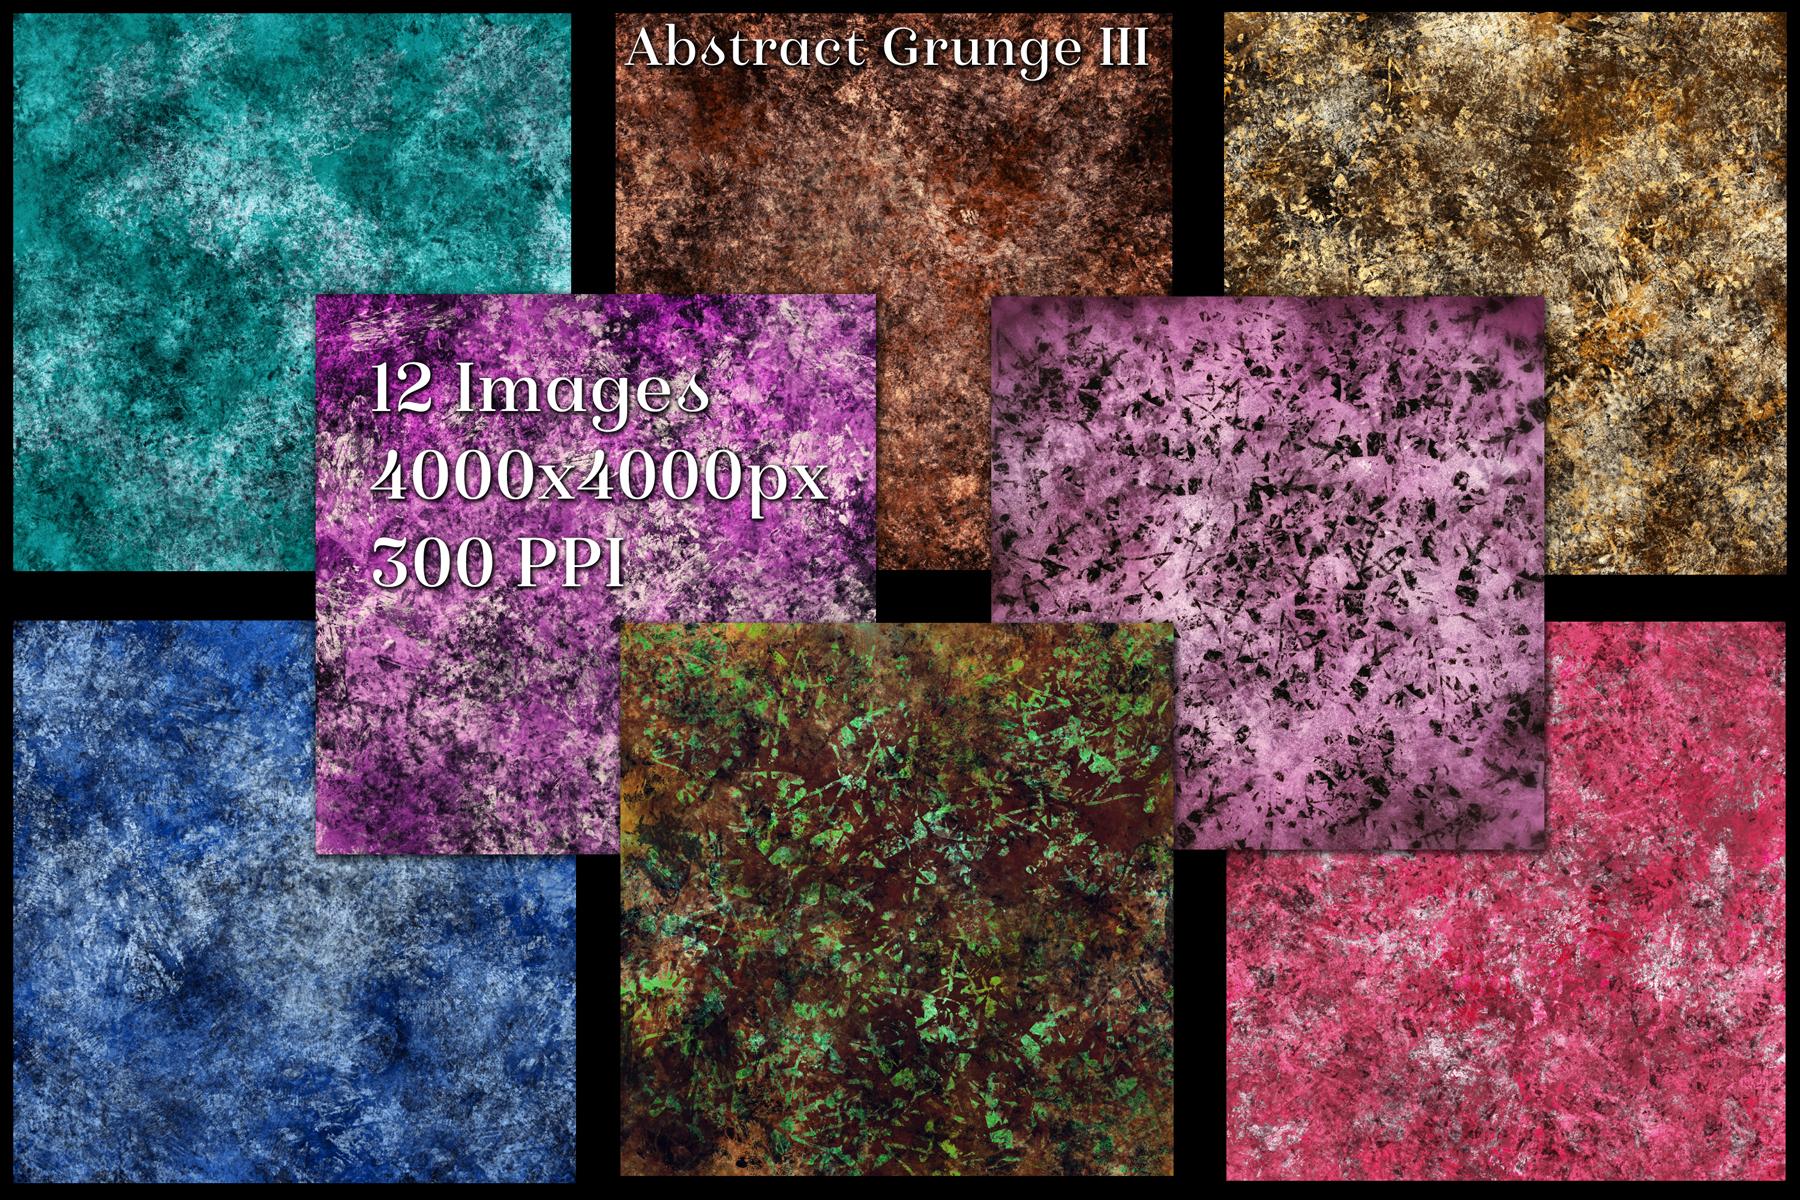 Abstract Grunge III Backgrounds - 12 Image Textures Set example image 2